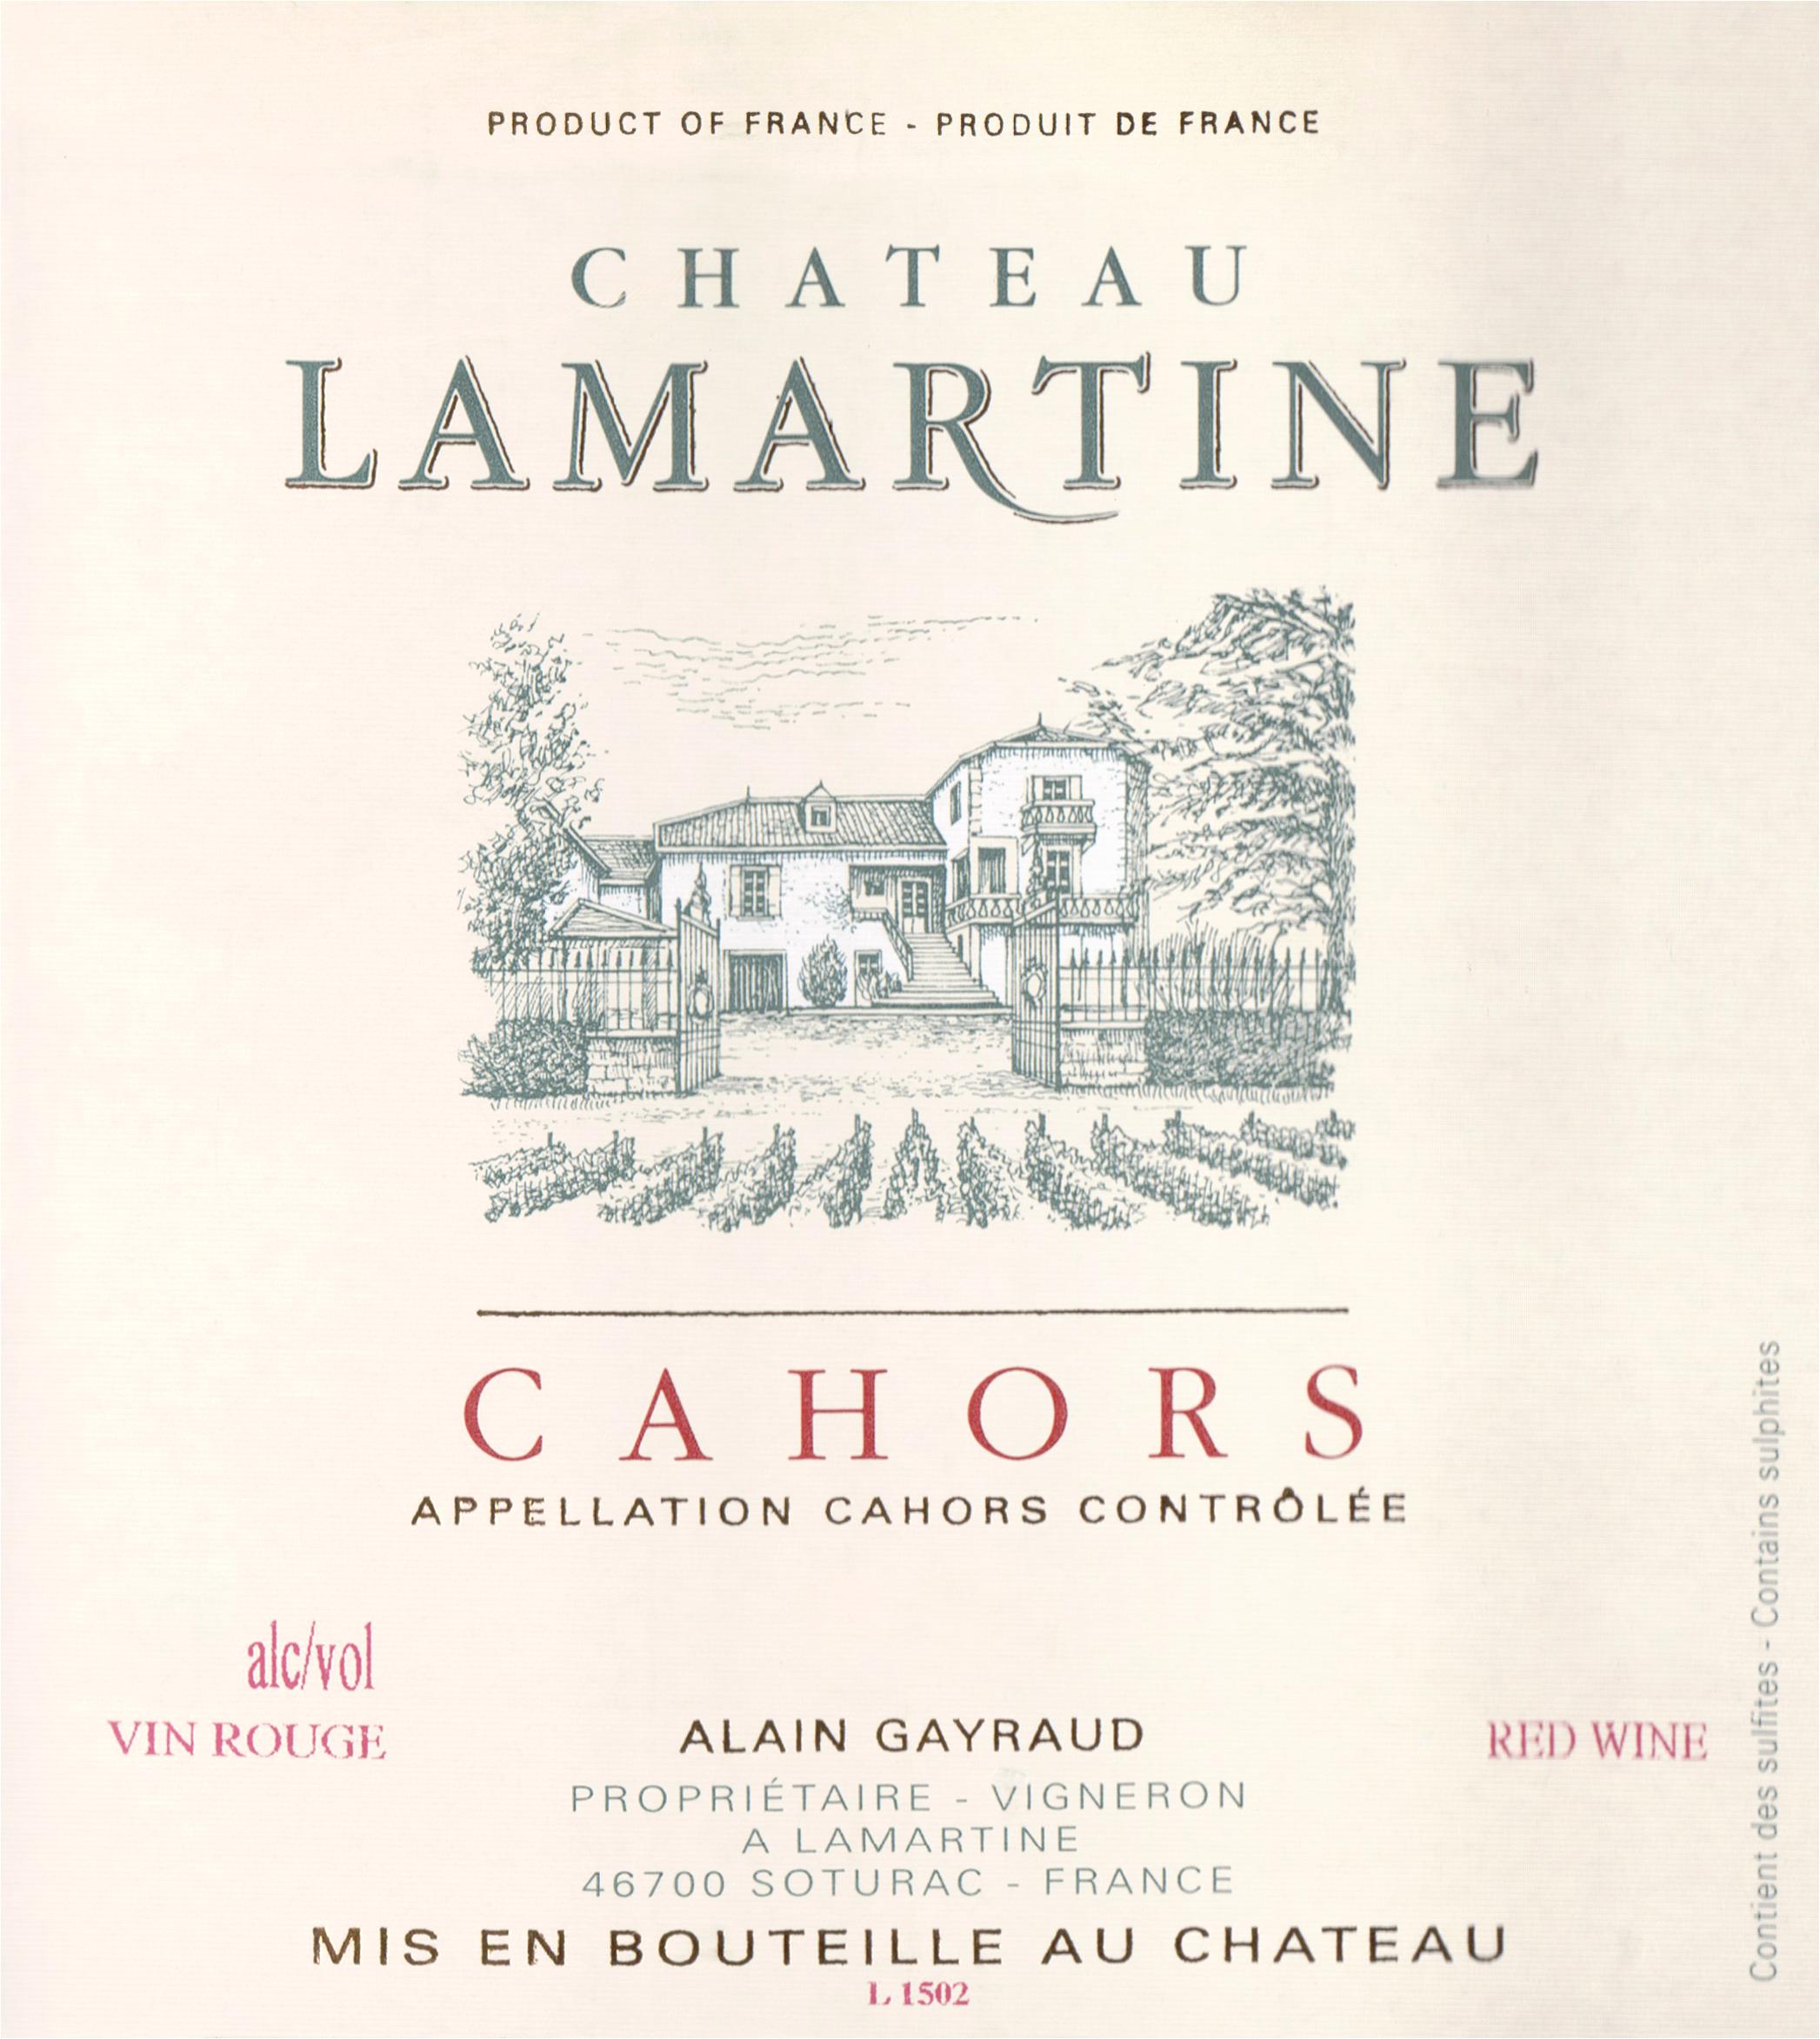 Chateau Lamartine Cahors 2016